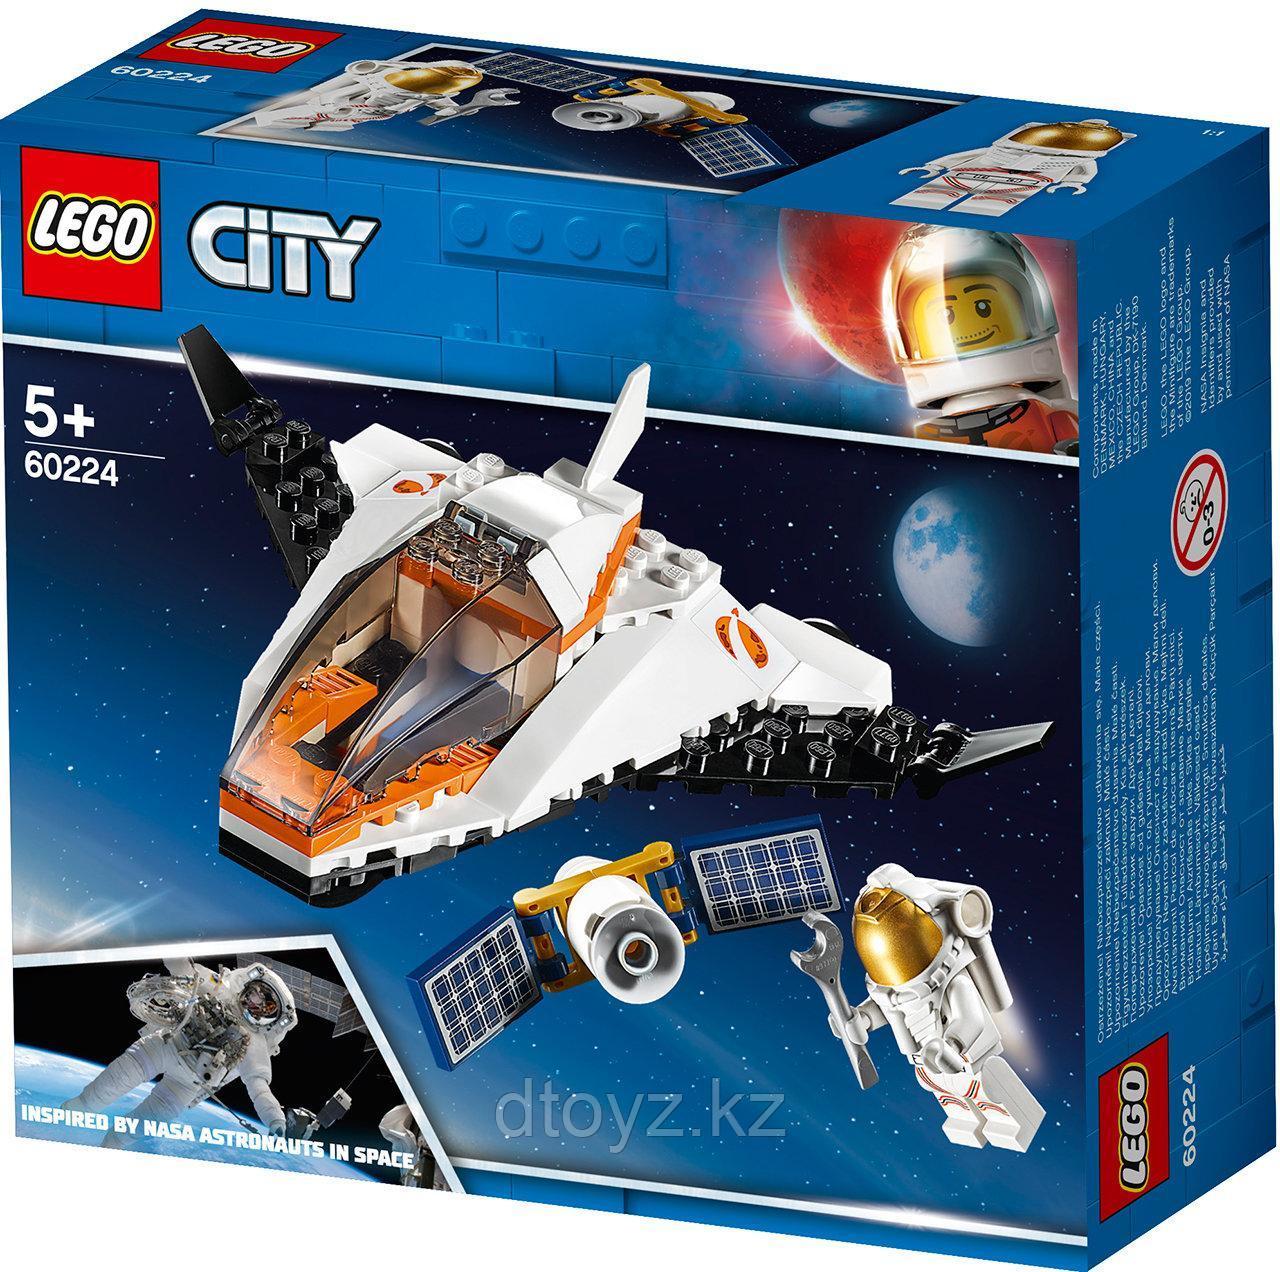 Lego City 60224 - Миссия по ремонту спутника Лего Сити